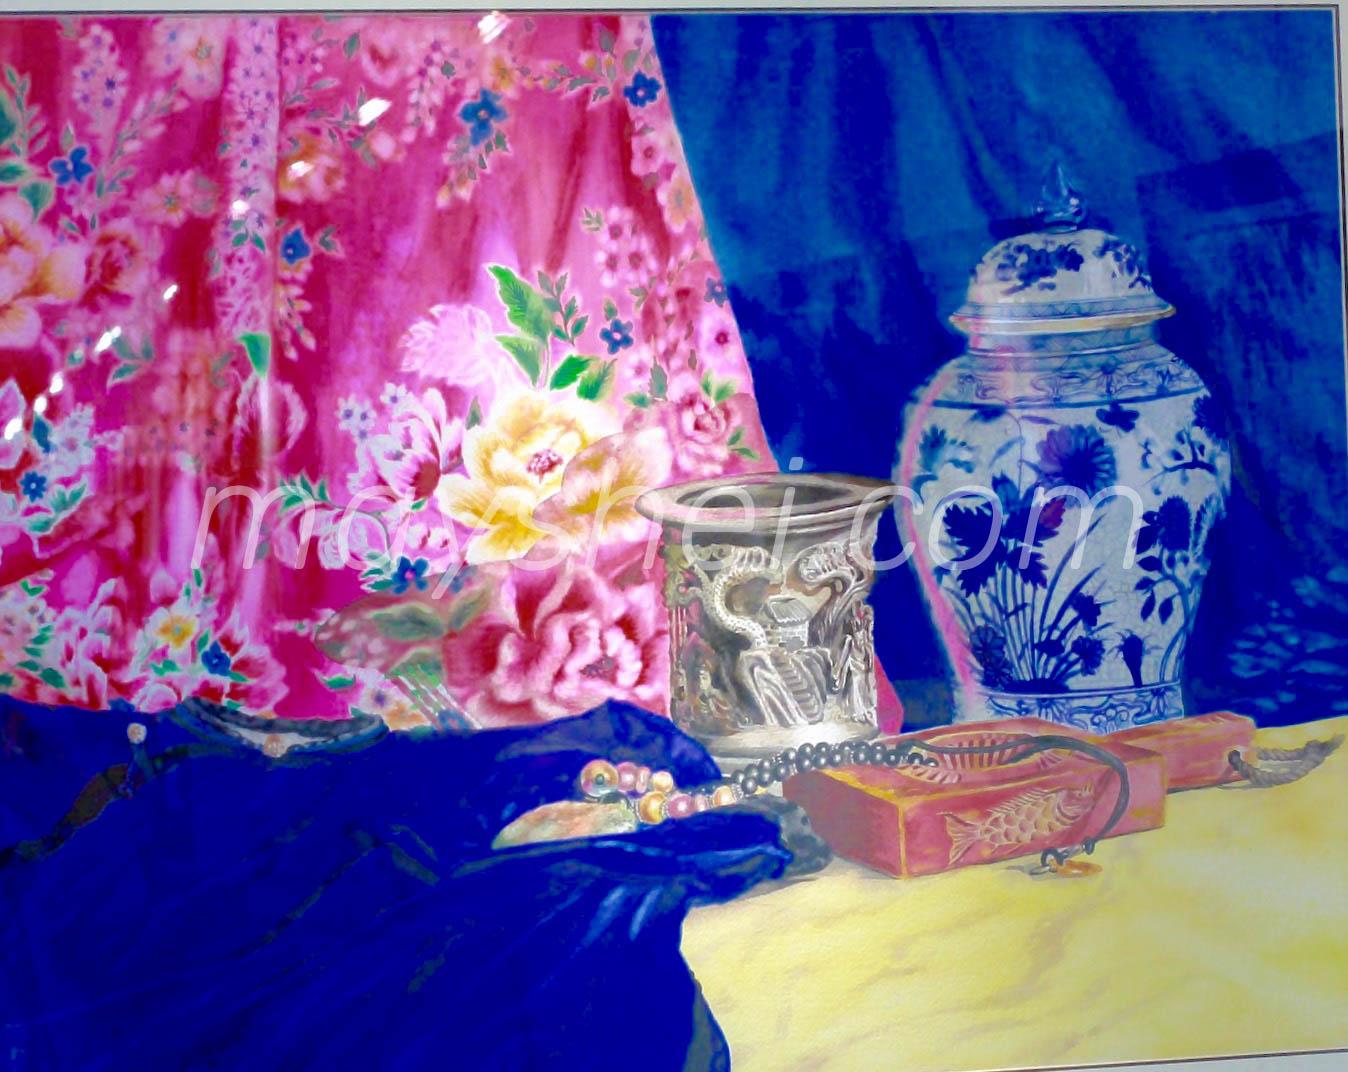 Vase & Blue Dress, 油桐花布系列-磁器藍衫圖